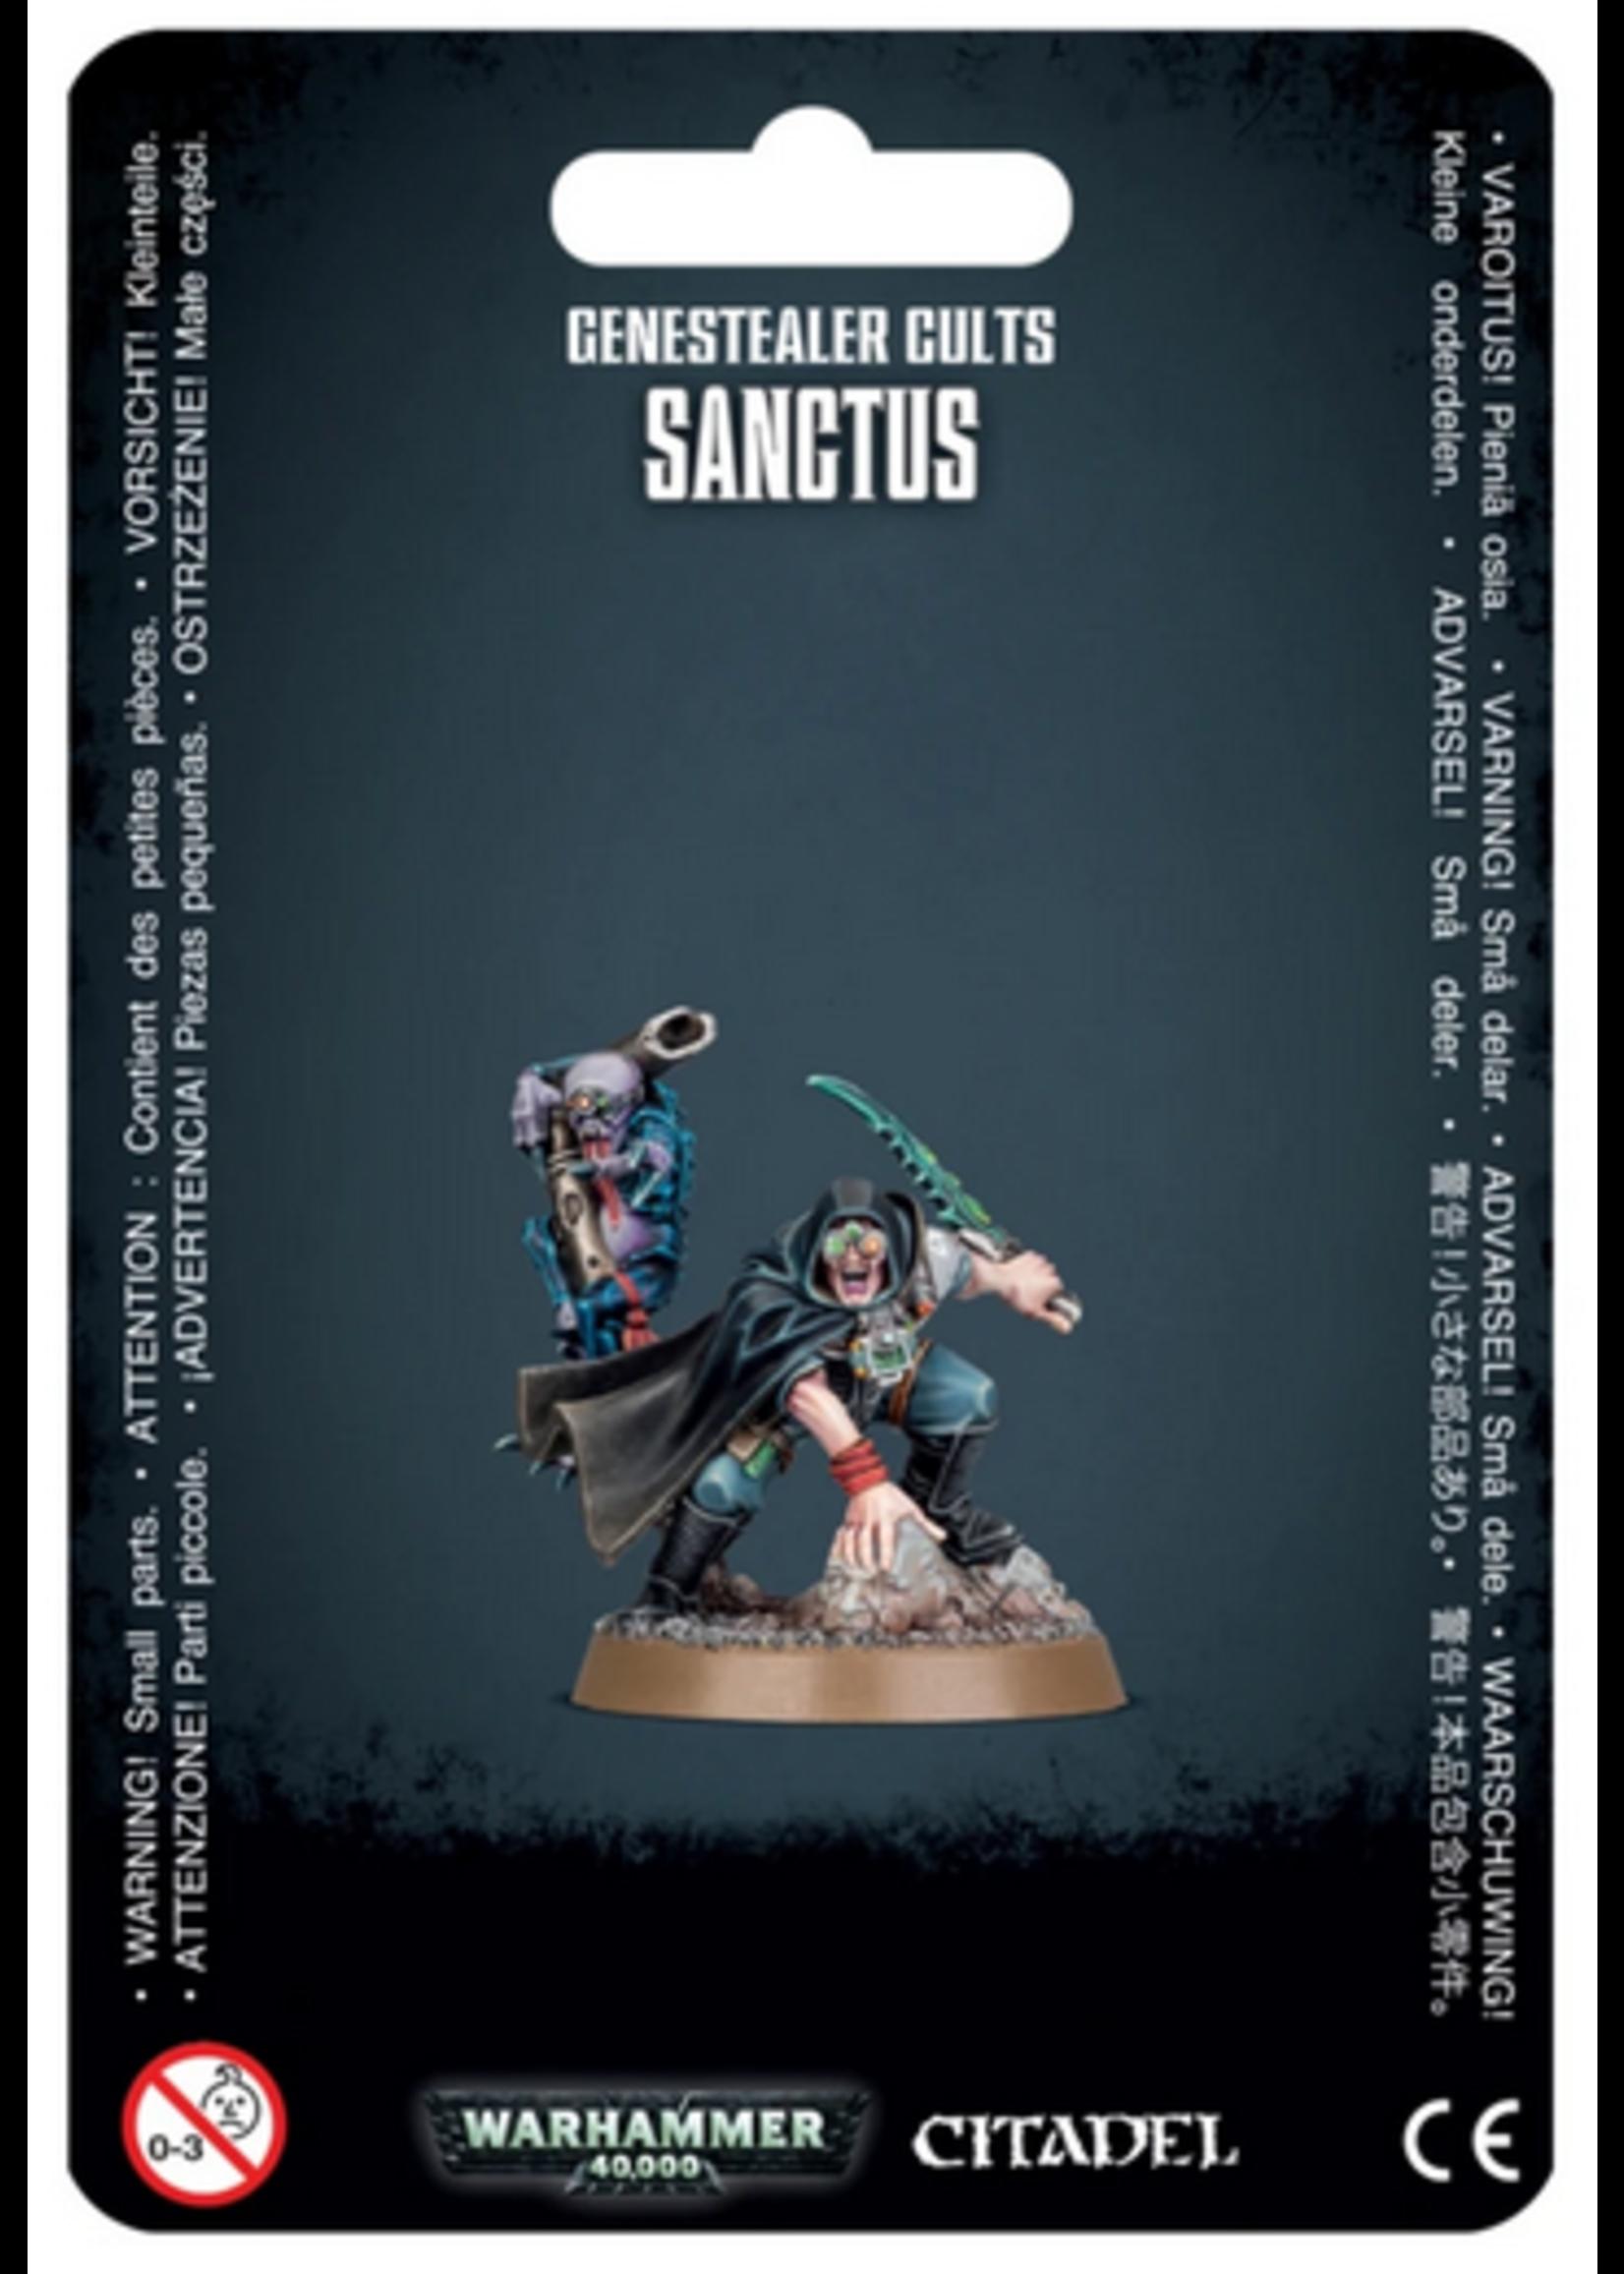 Genestealer Cults Sanctus (40K)